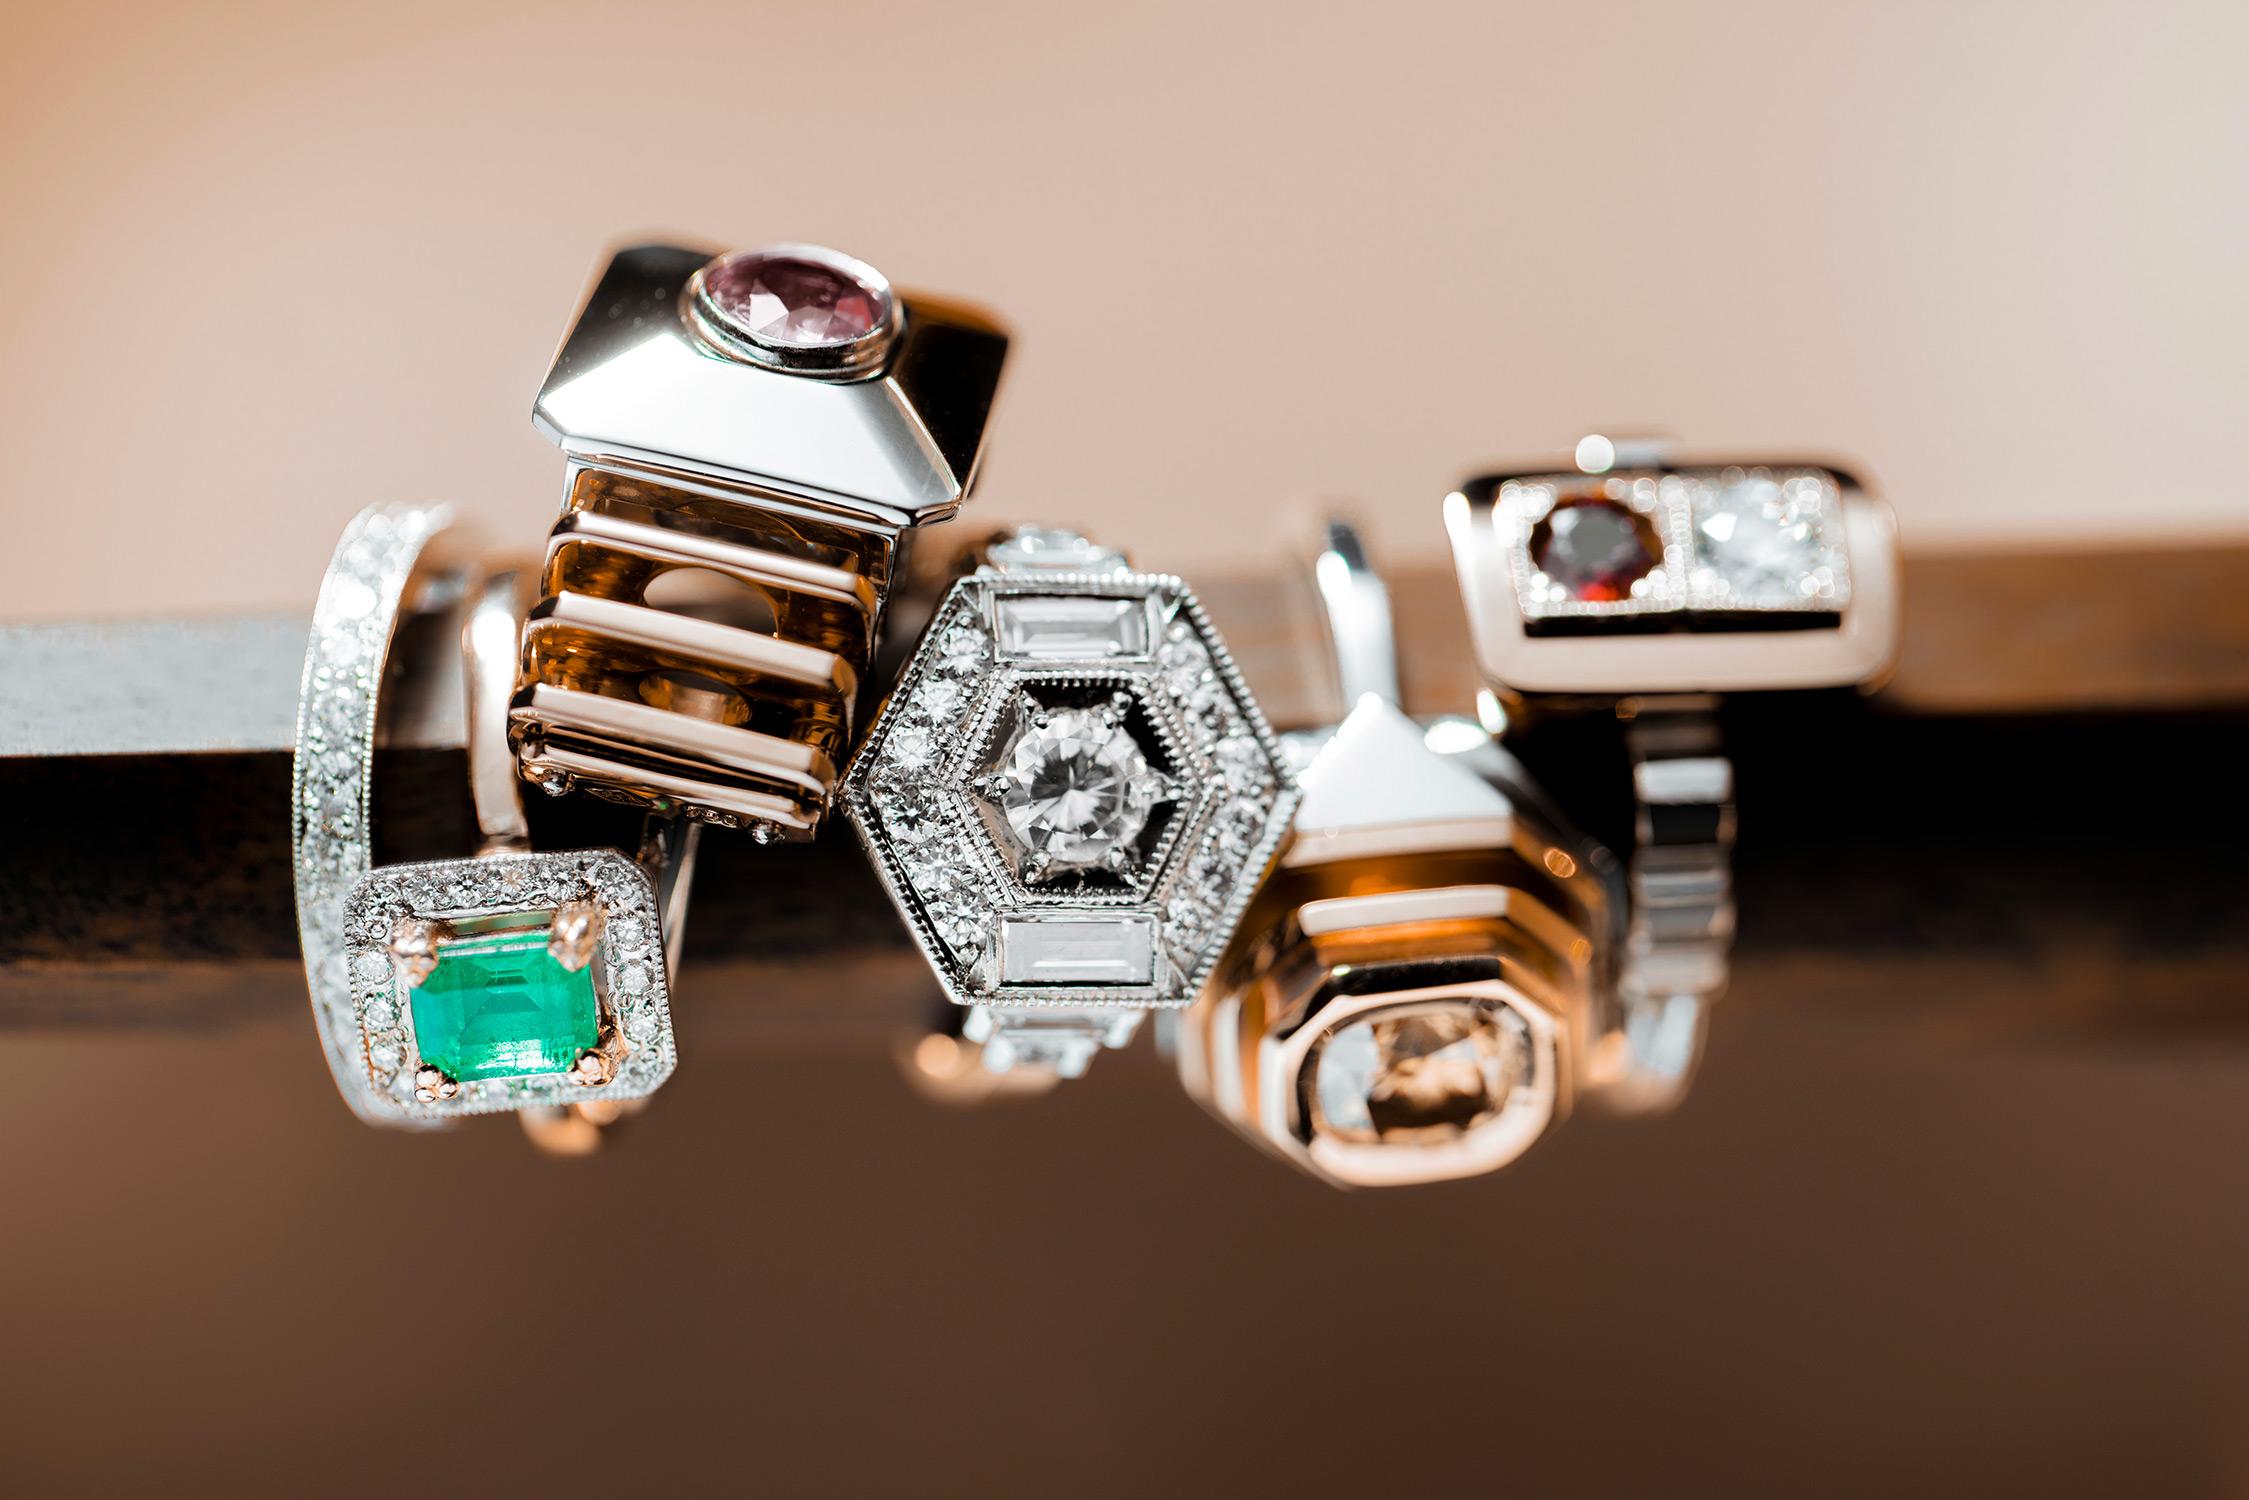 bespoke-melbourne-design-custom-made-jewellery-11.jpg